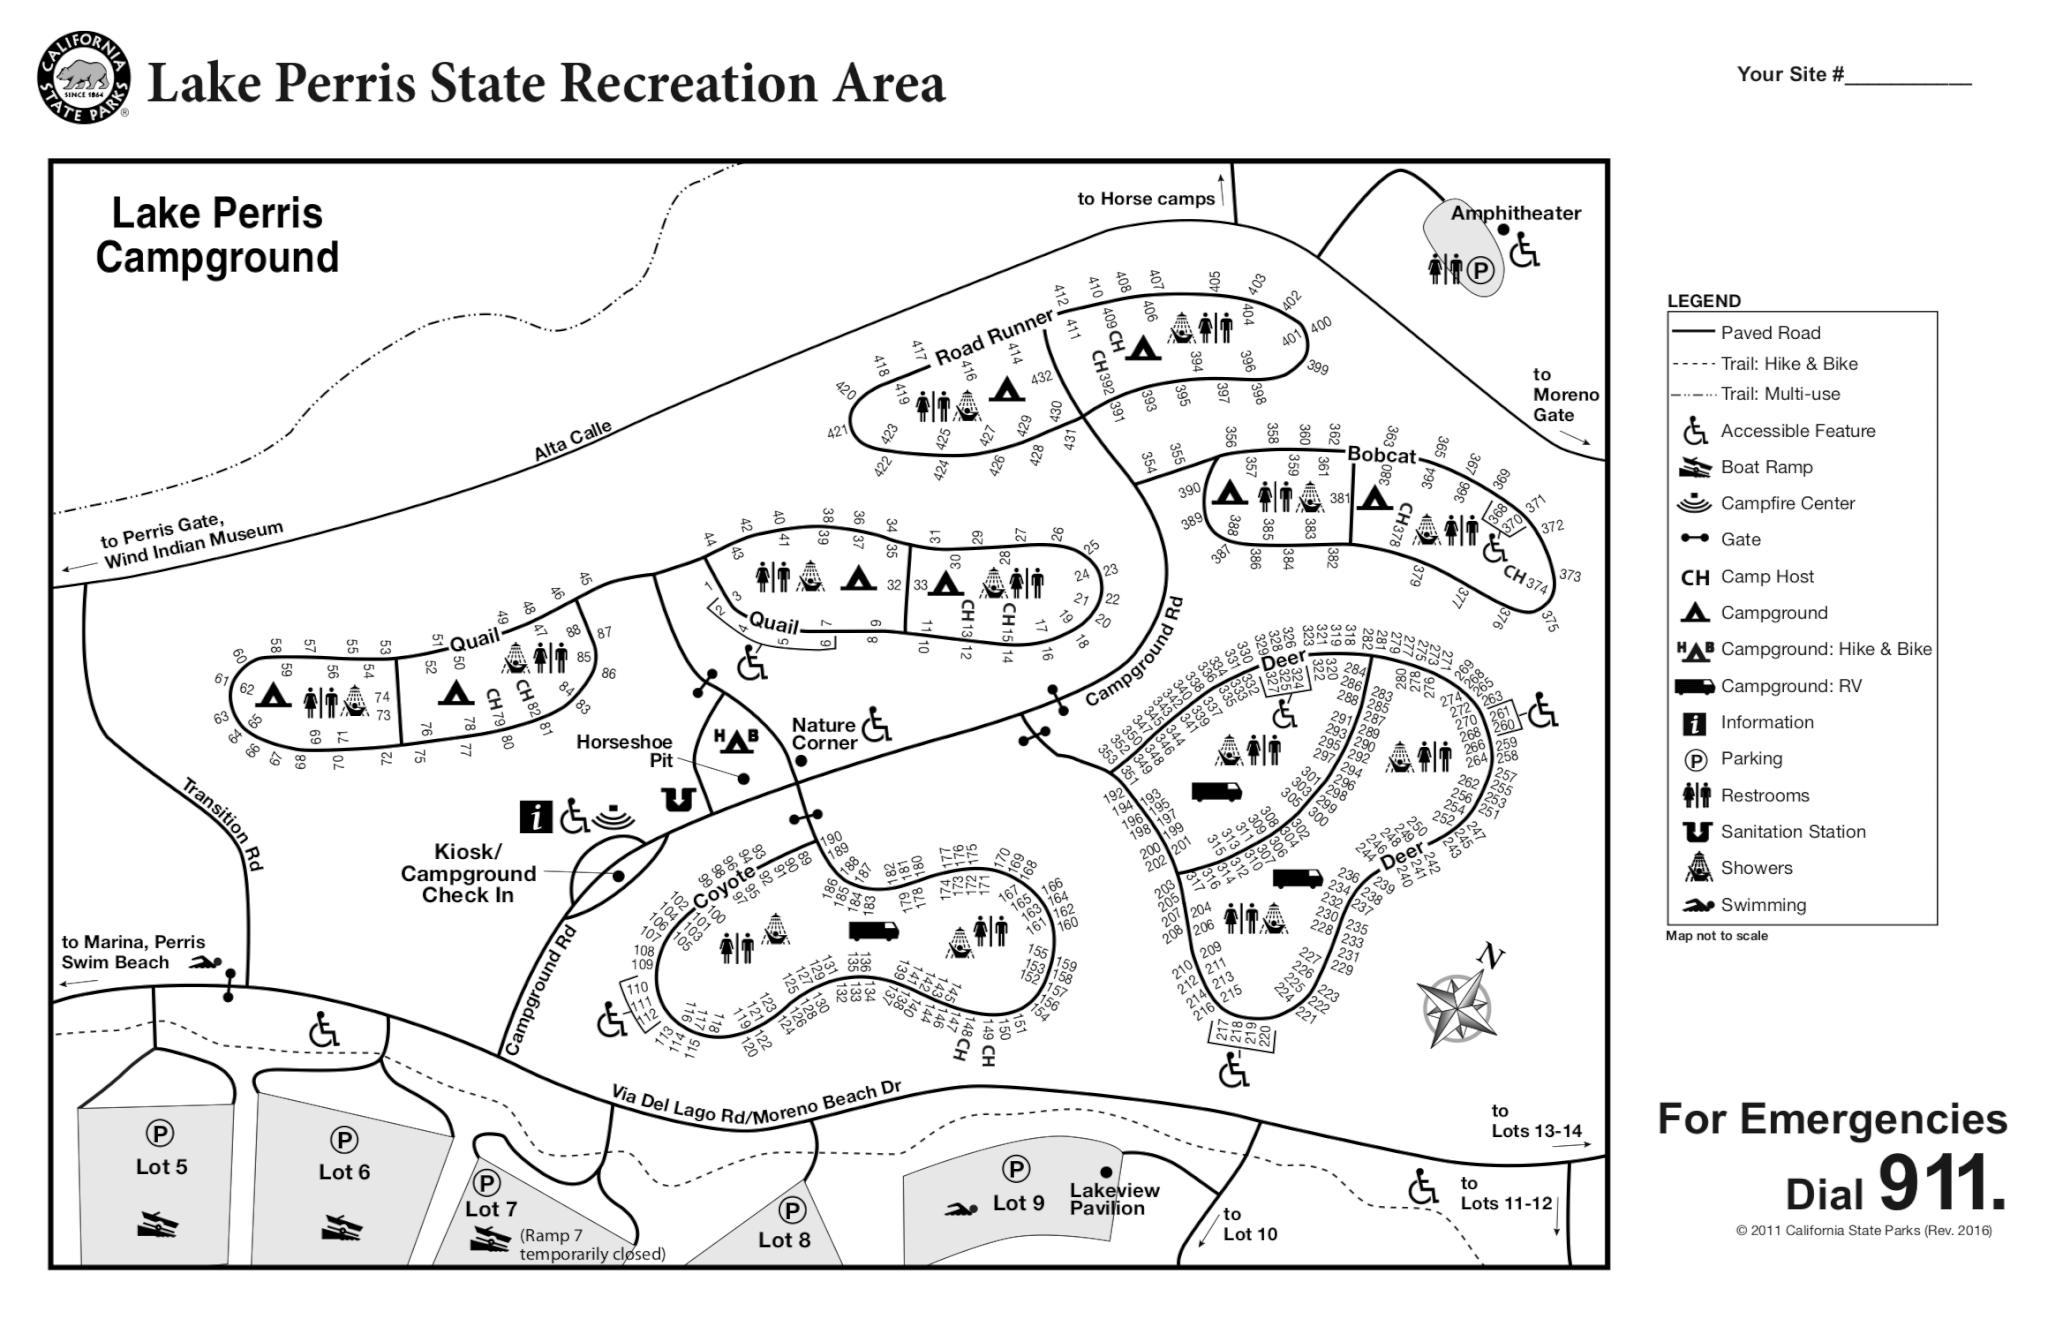 Lake perris campsite photos and camping information for Lake perris fishing report